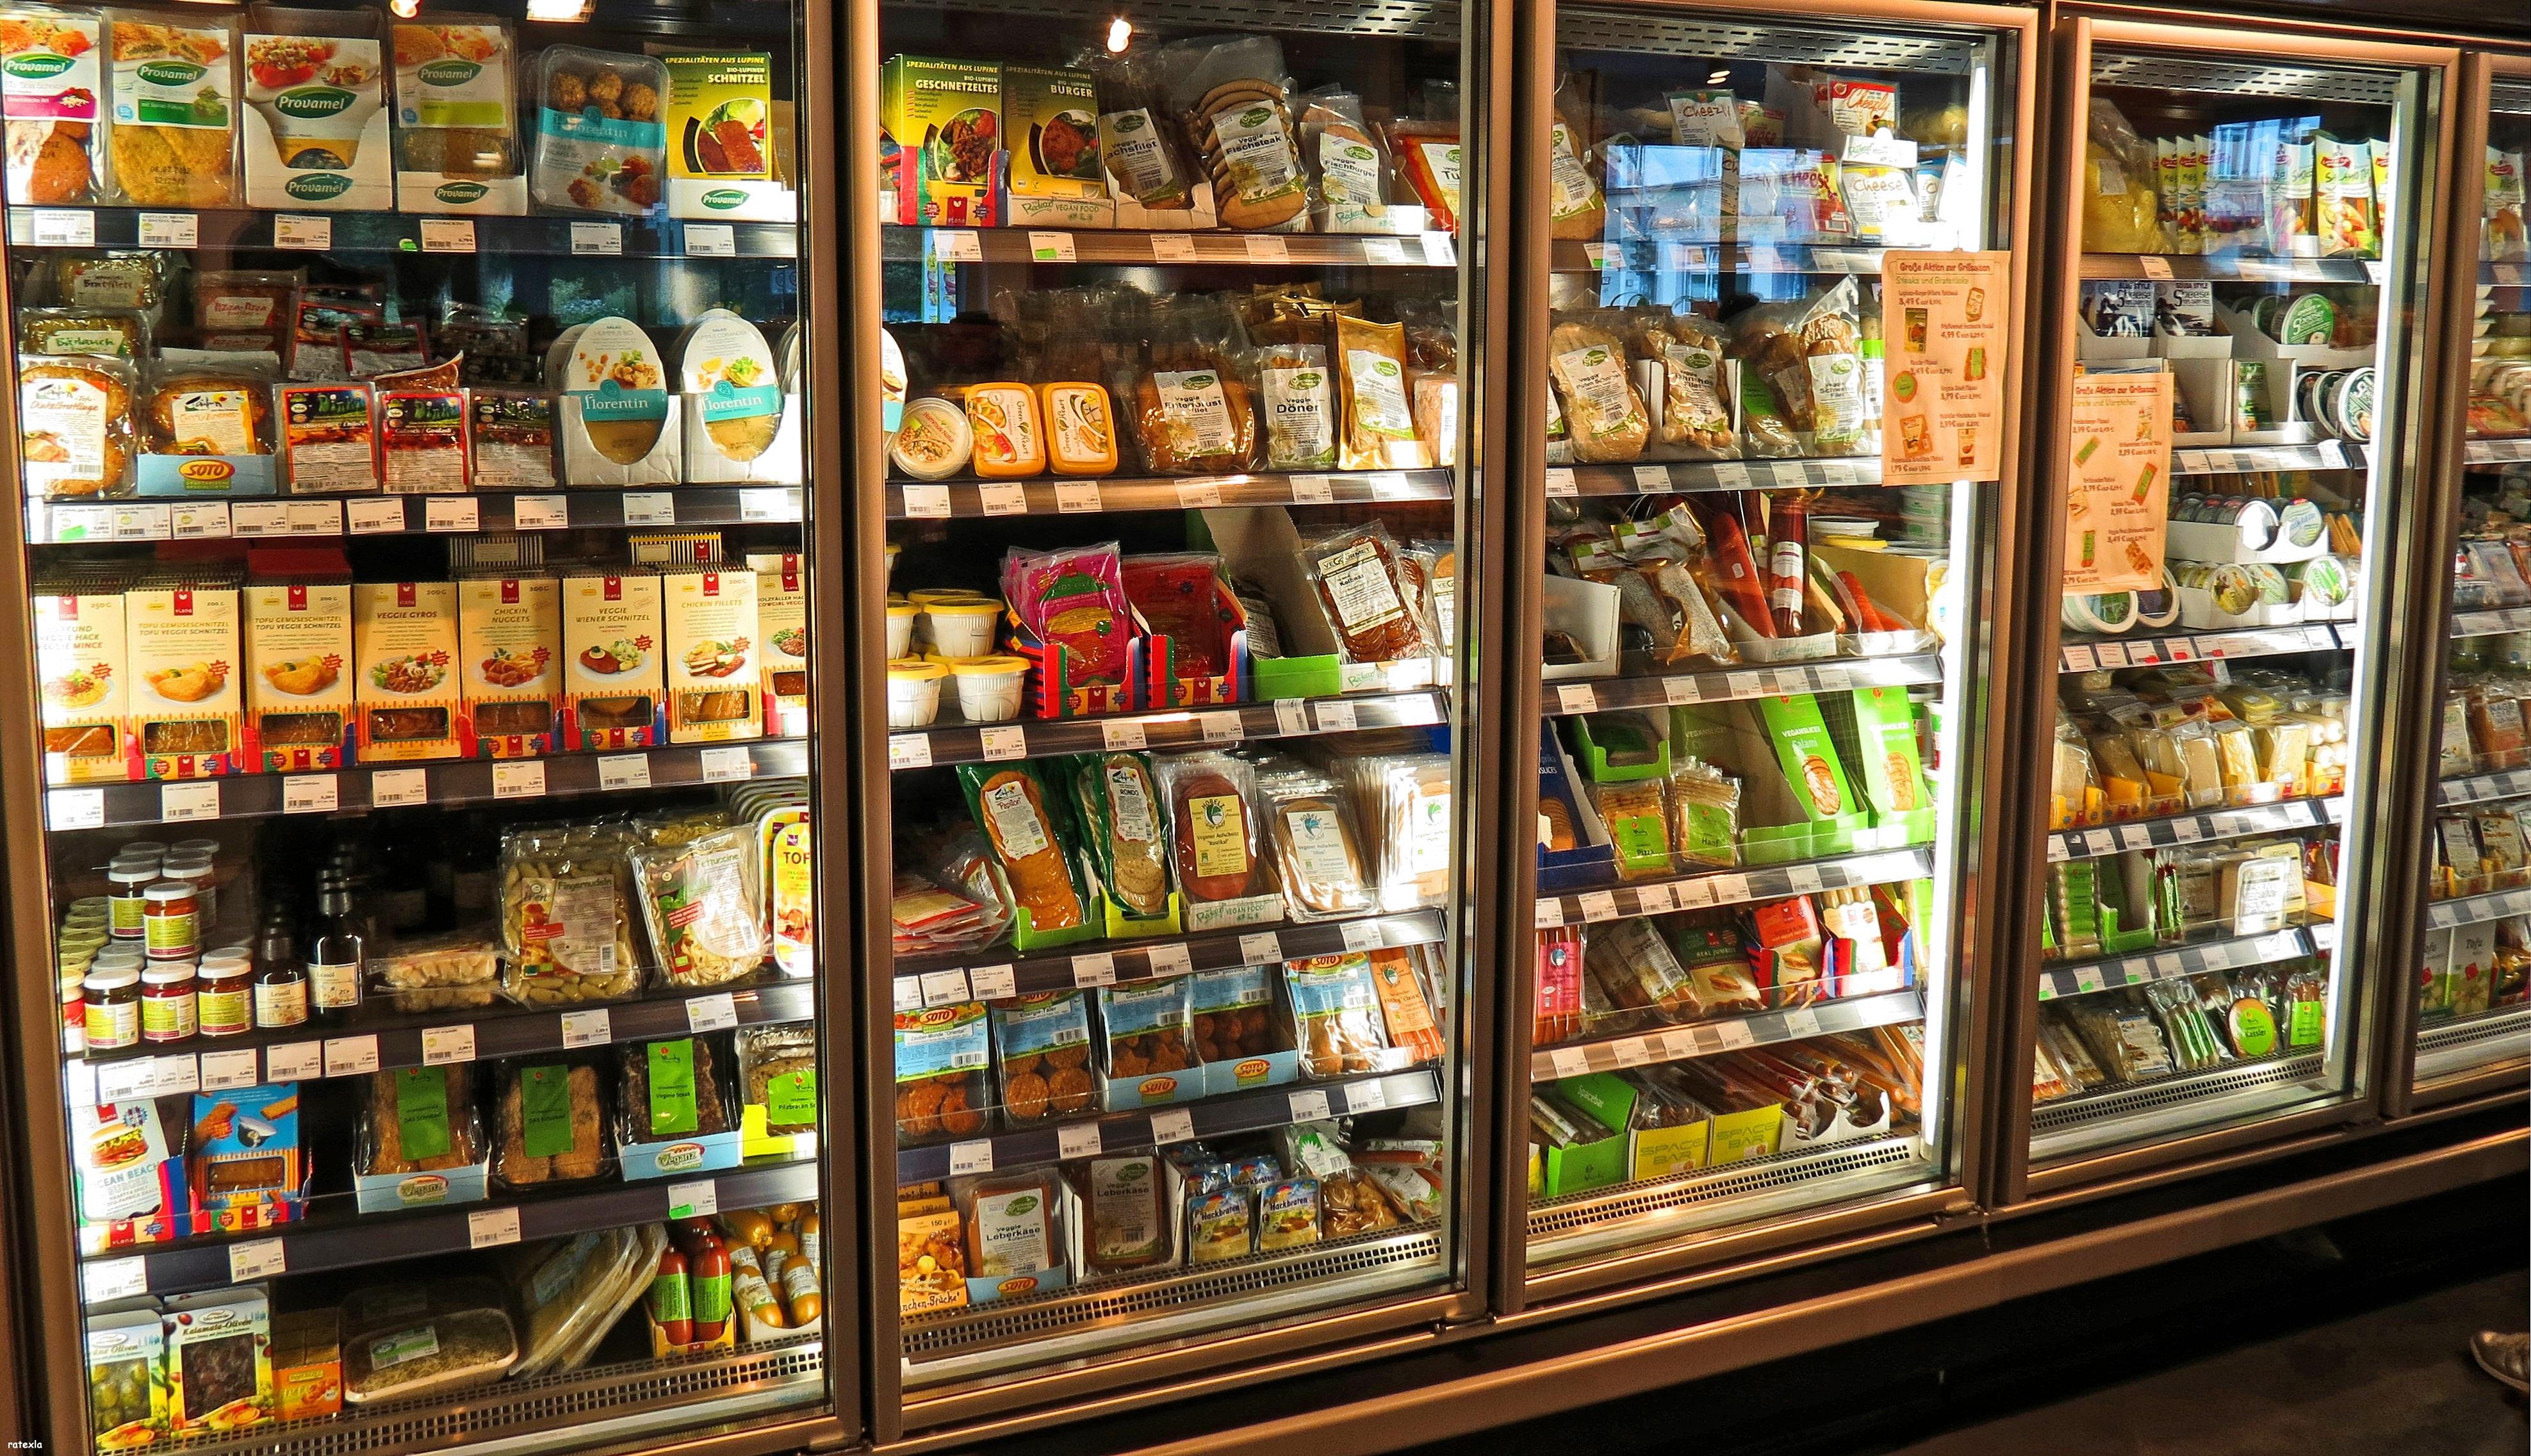 cold-interior-shop-store-food-produce-ma